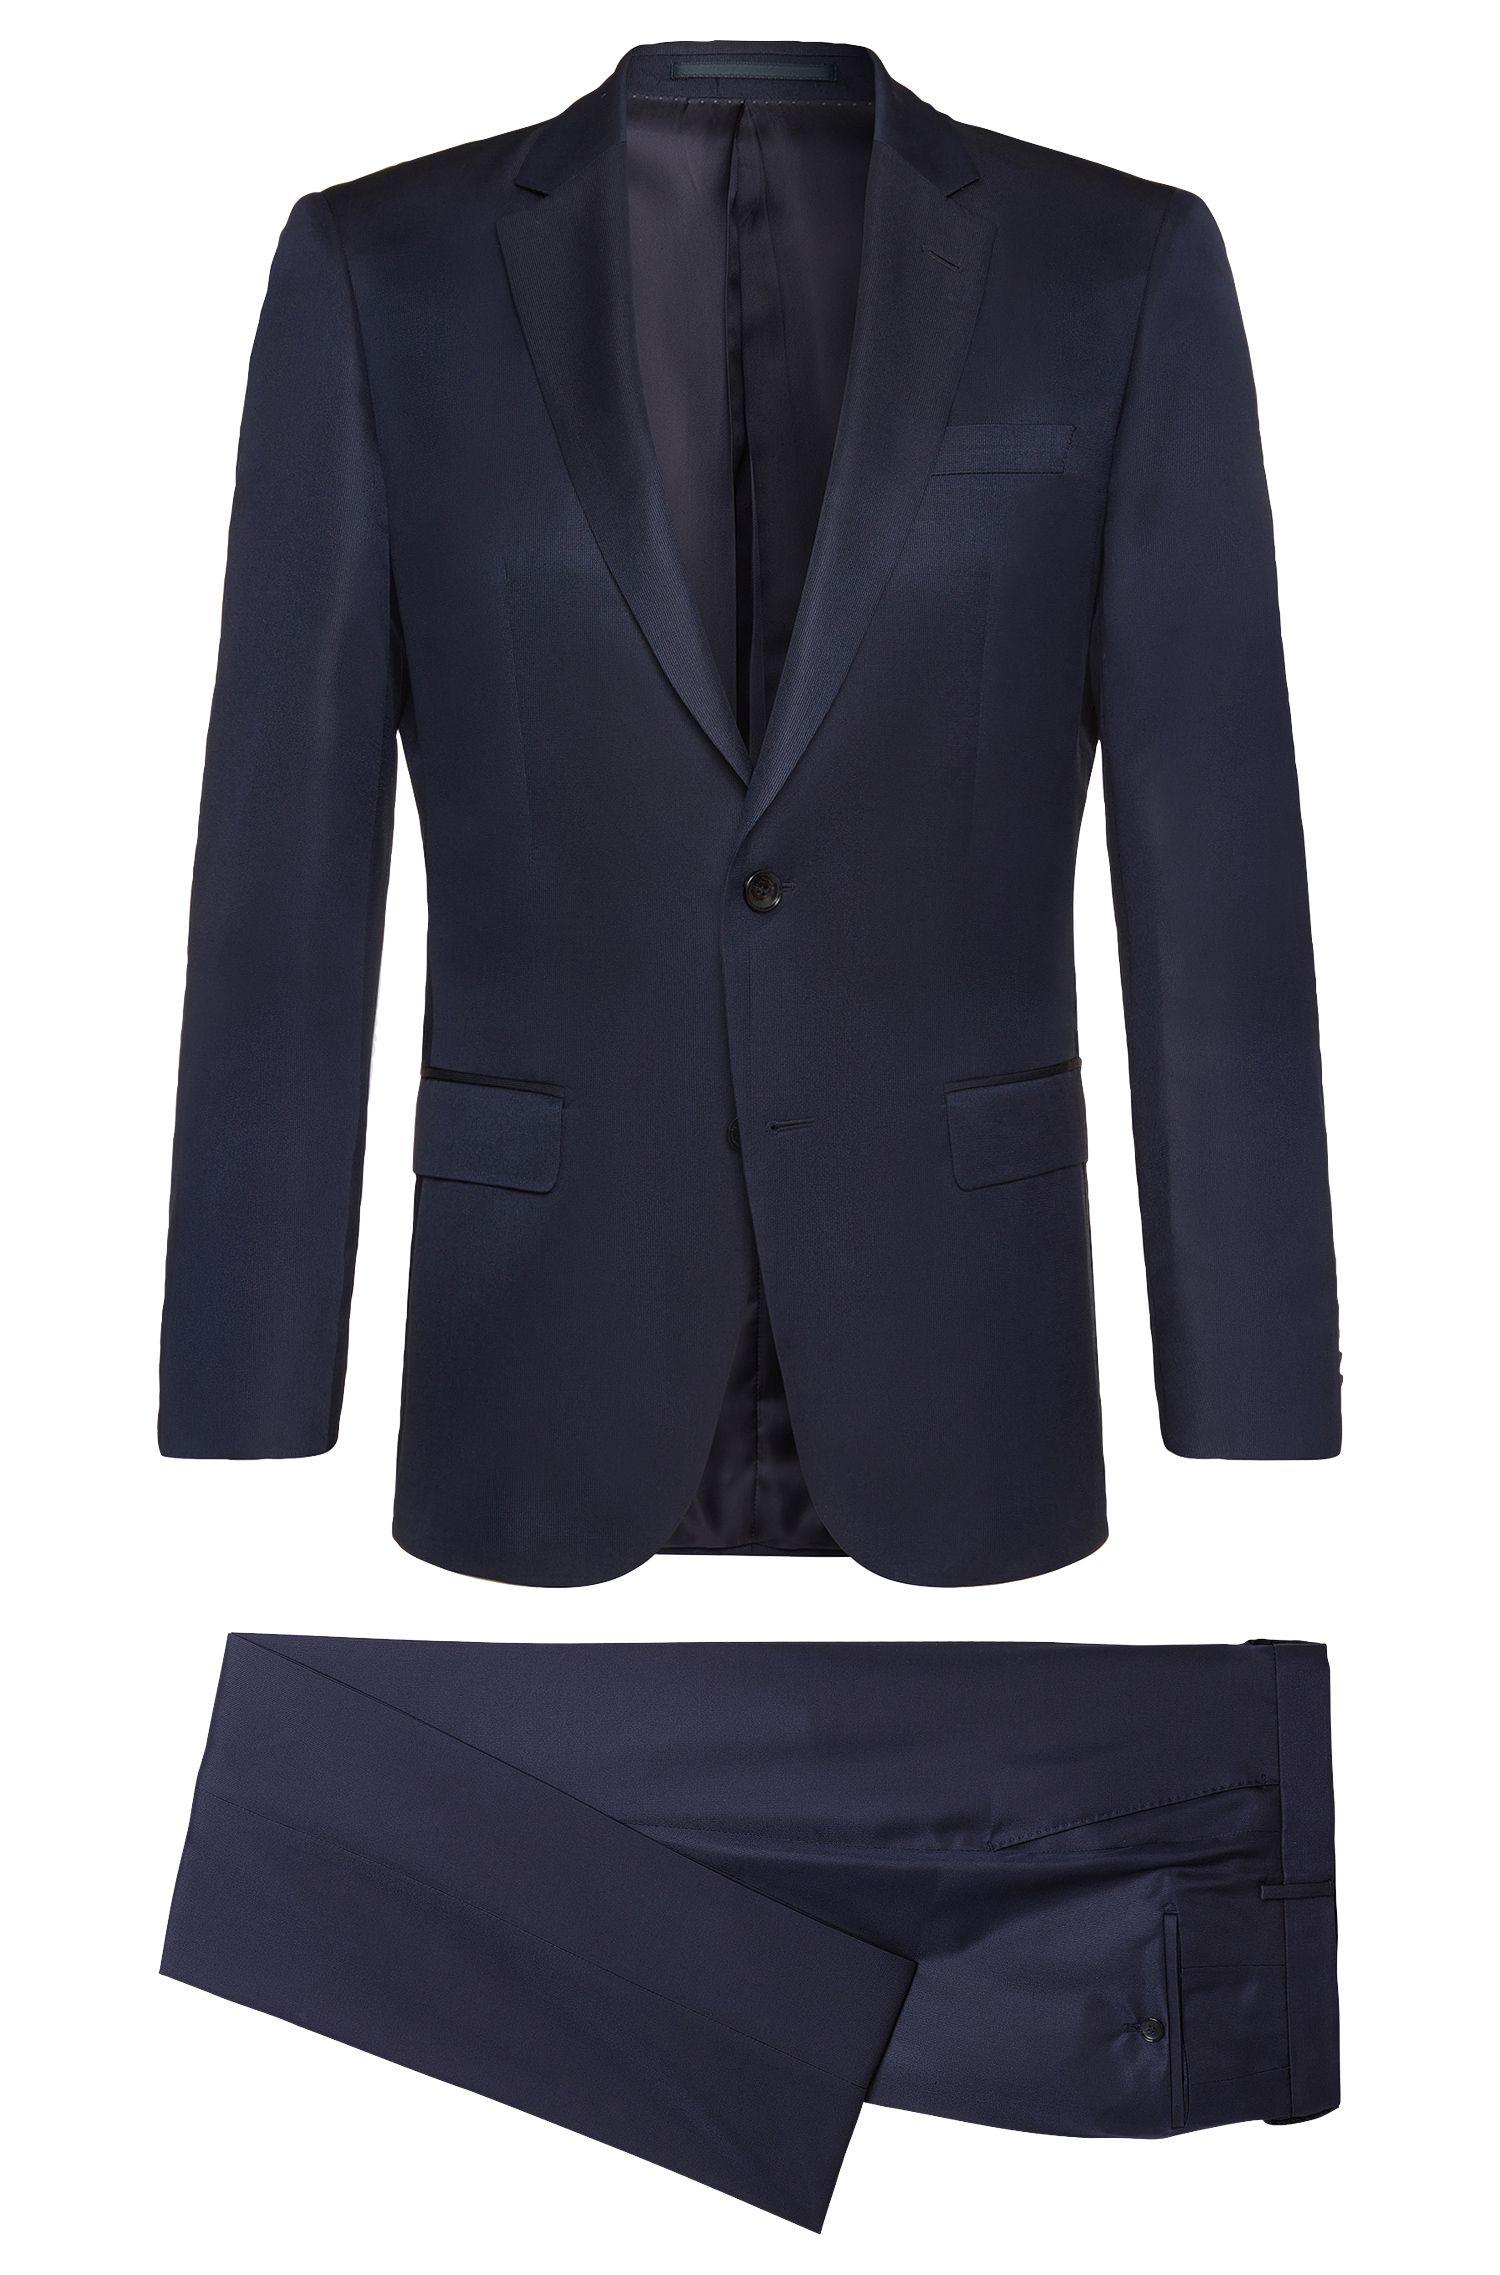 'T-Harvers/Glover' | Slim Fit, Italian Silk Suit